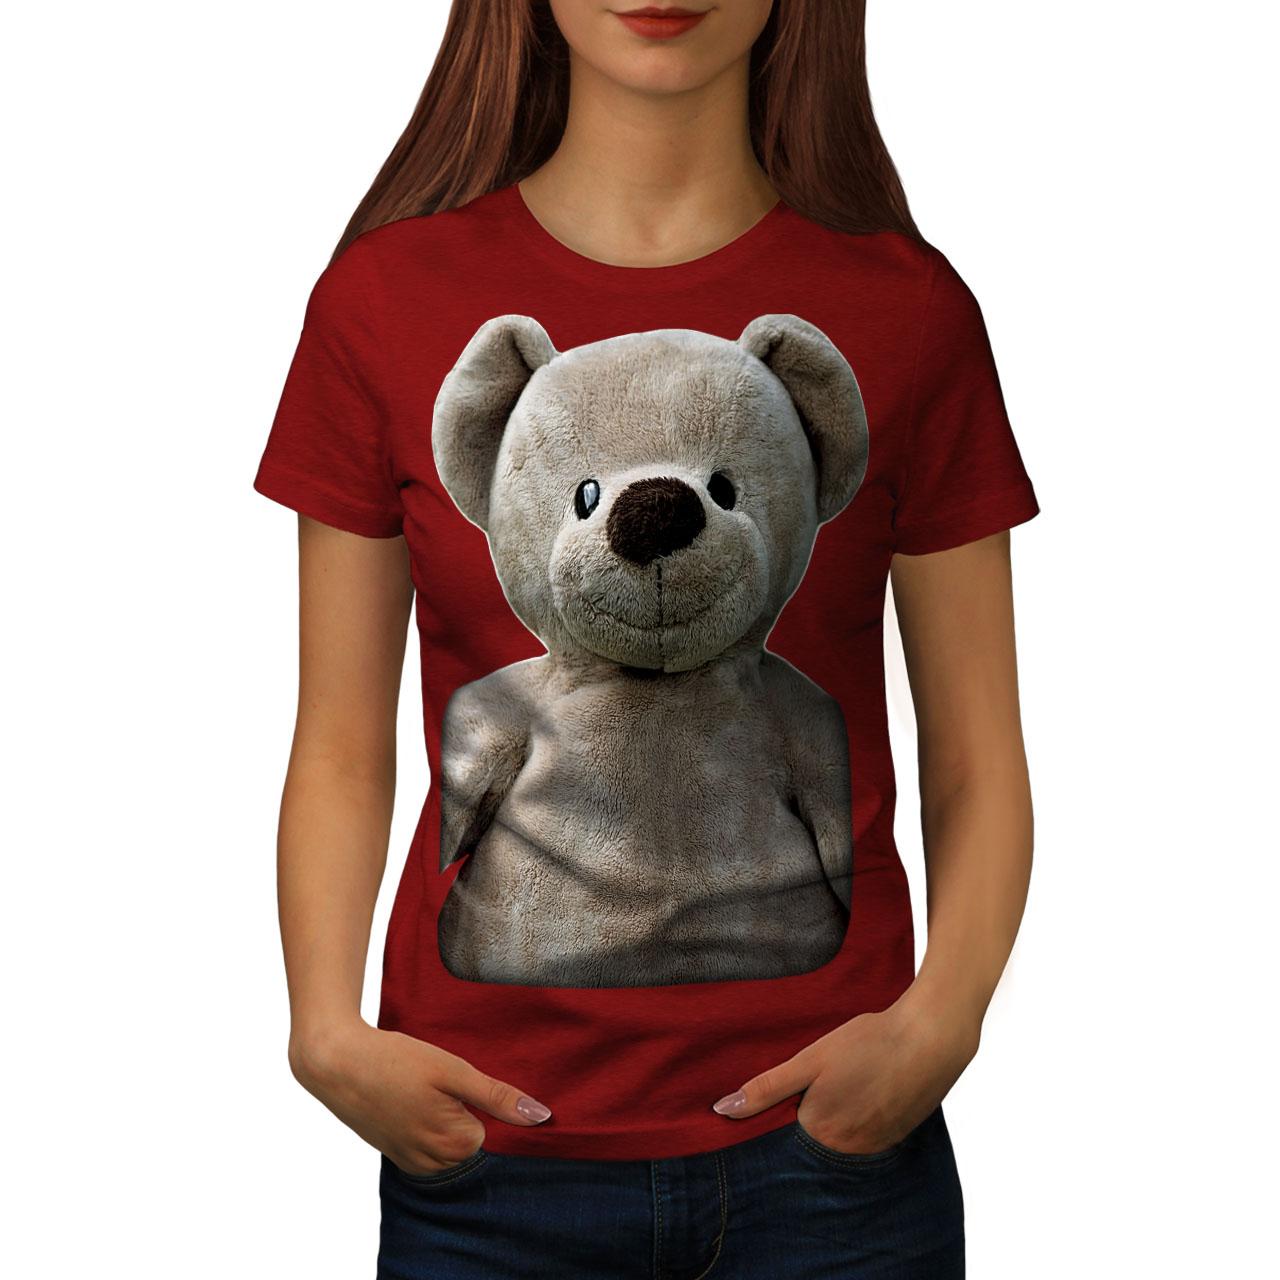 miniature 9 - Wellcoda Cute Plush Womens T-shirt, Teddy Bear Casual Design Printed Tee